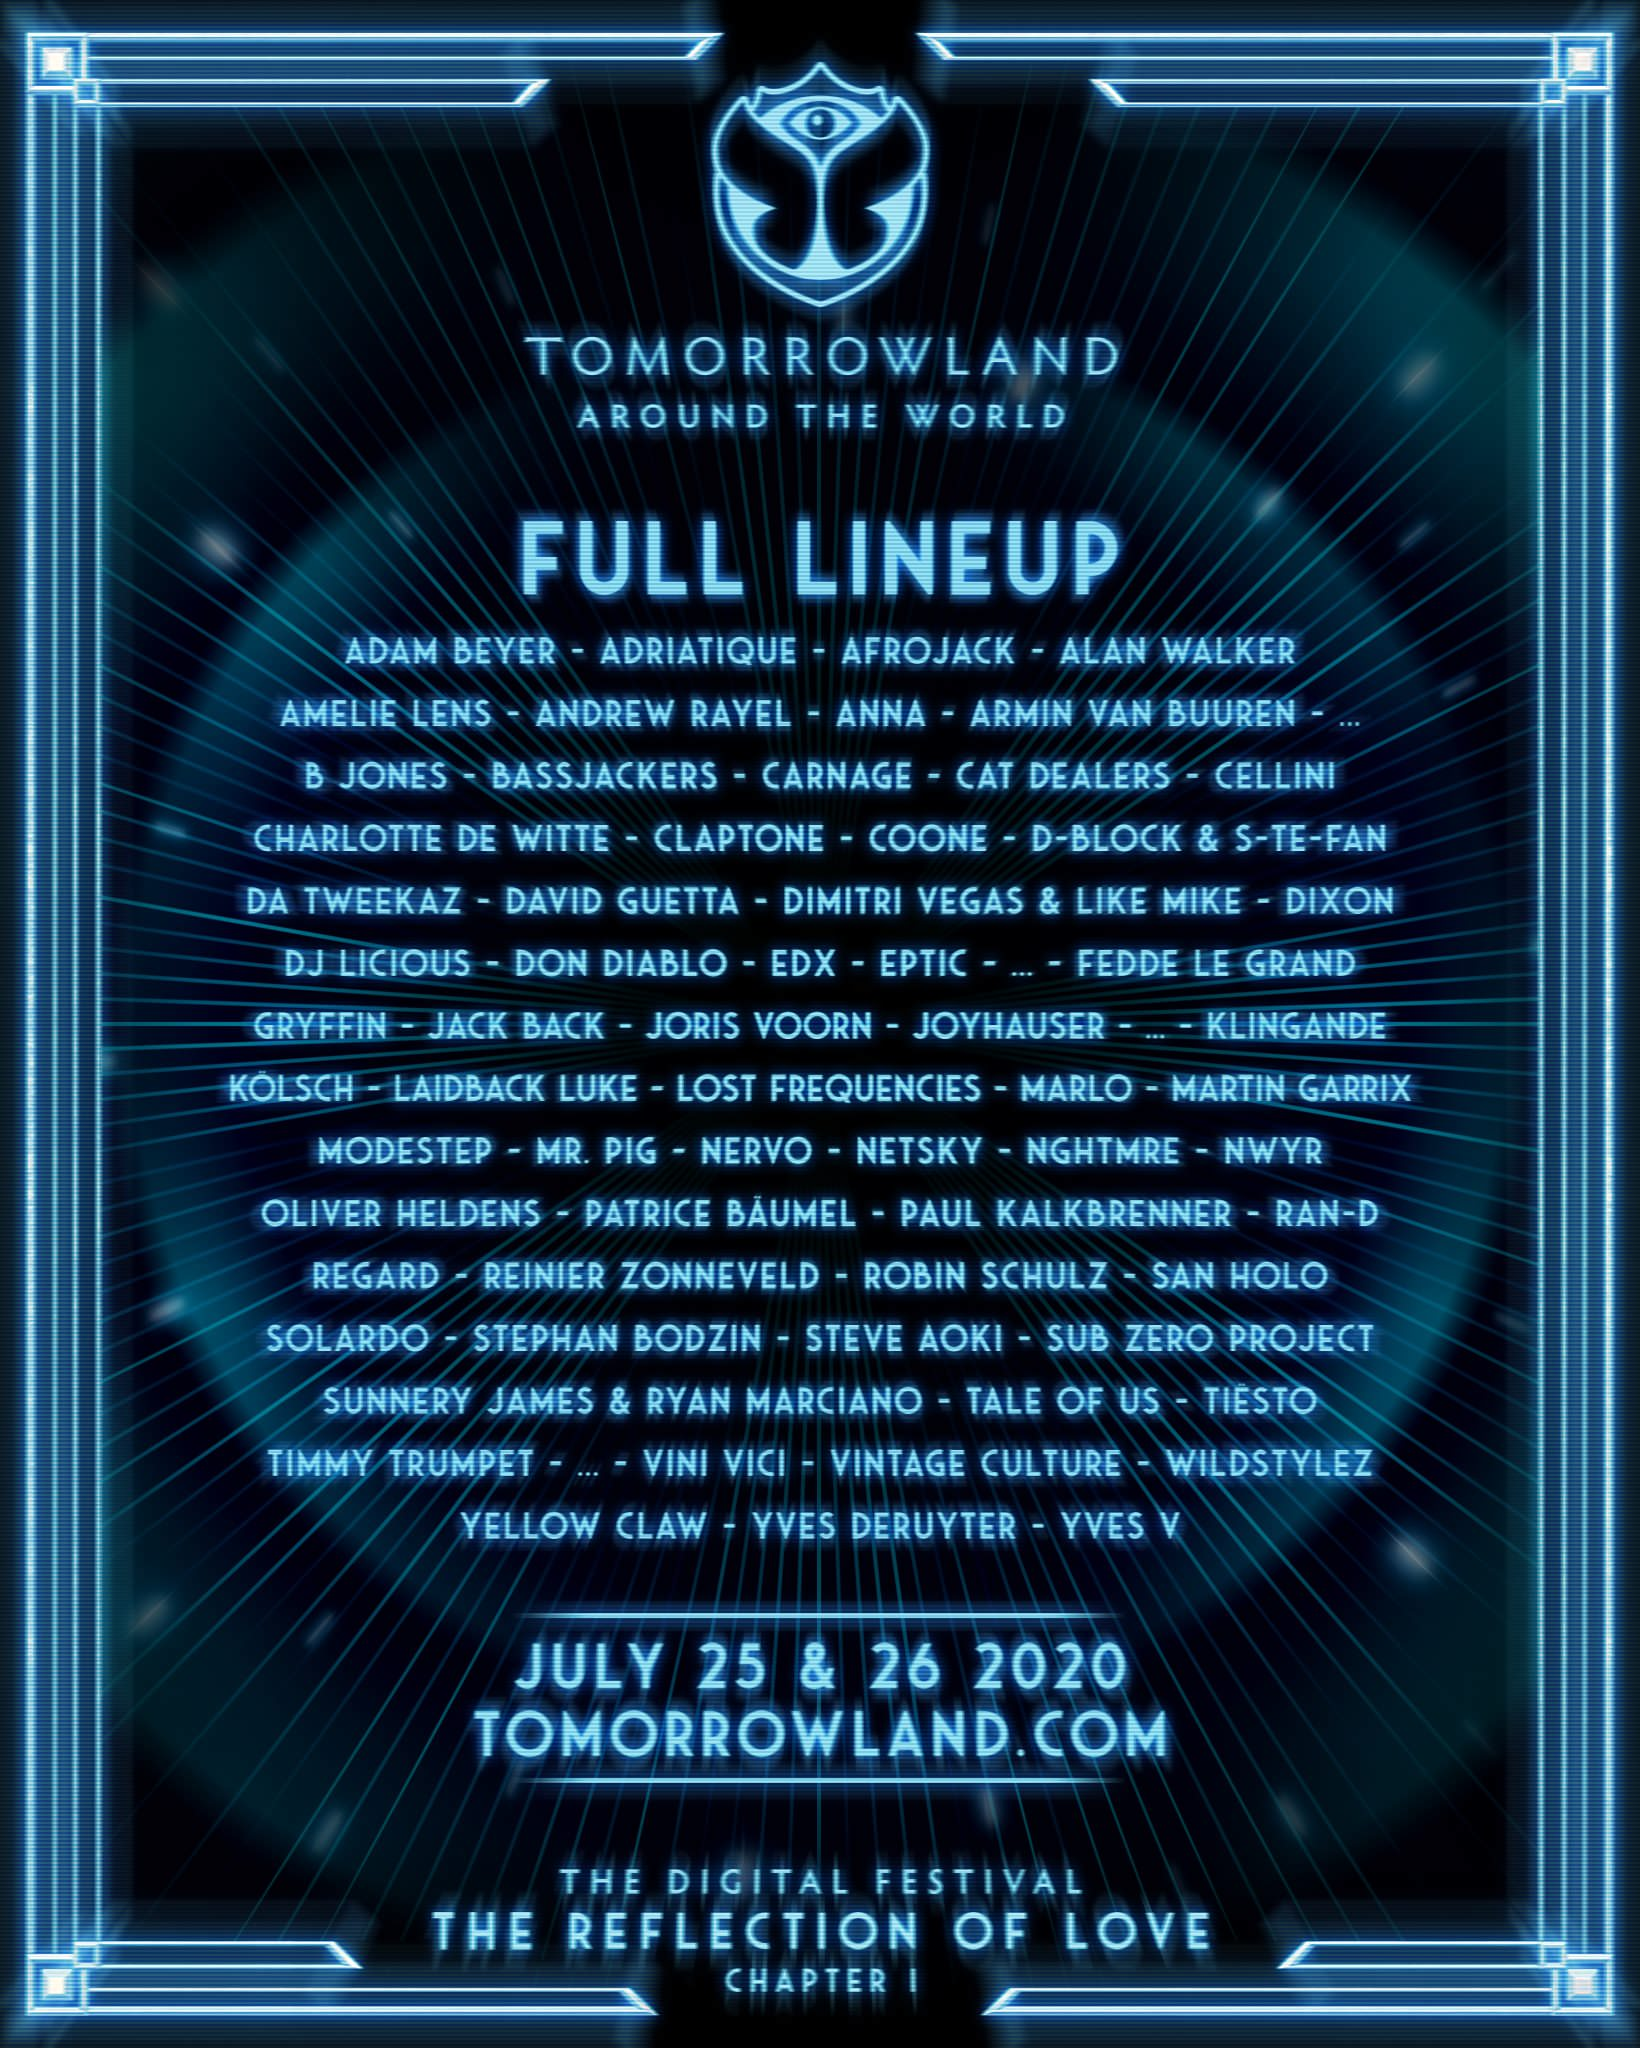 Lineup Tomorrowland 2020